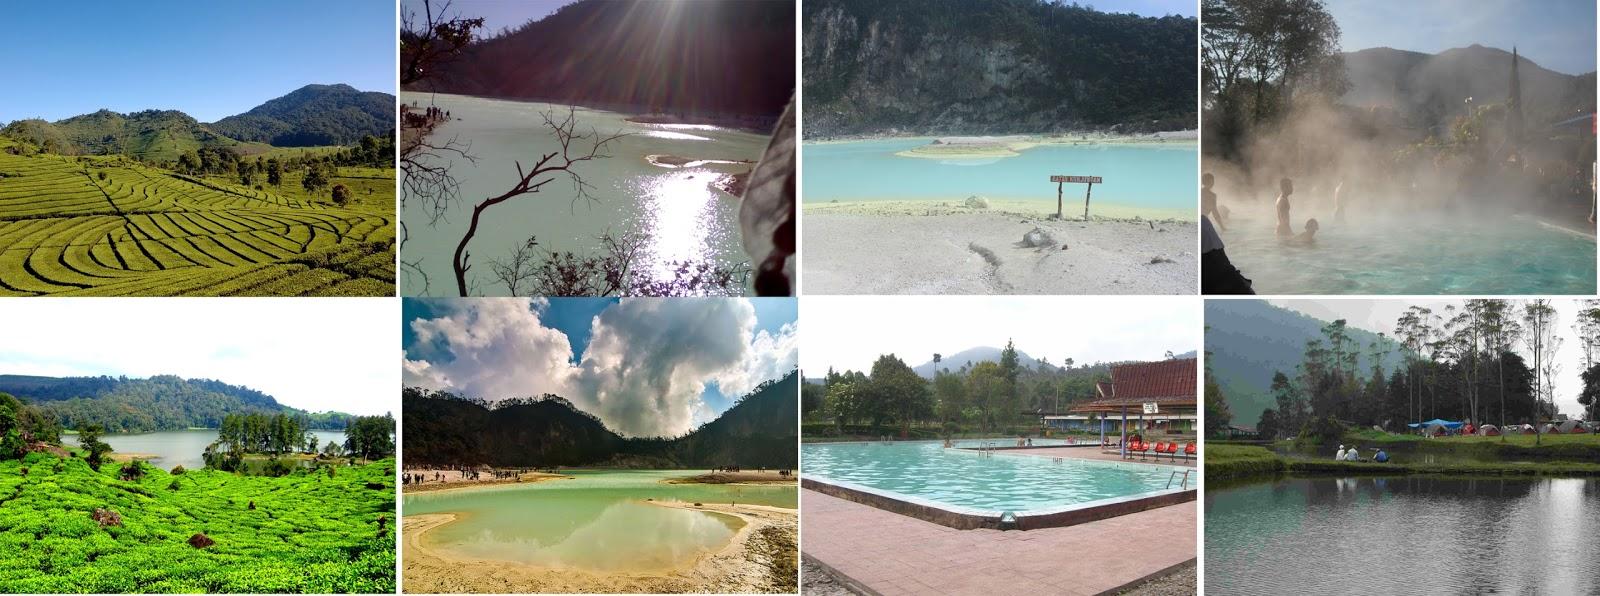 Ciwidey dan Alam Bandung Selatan